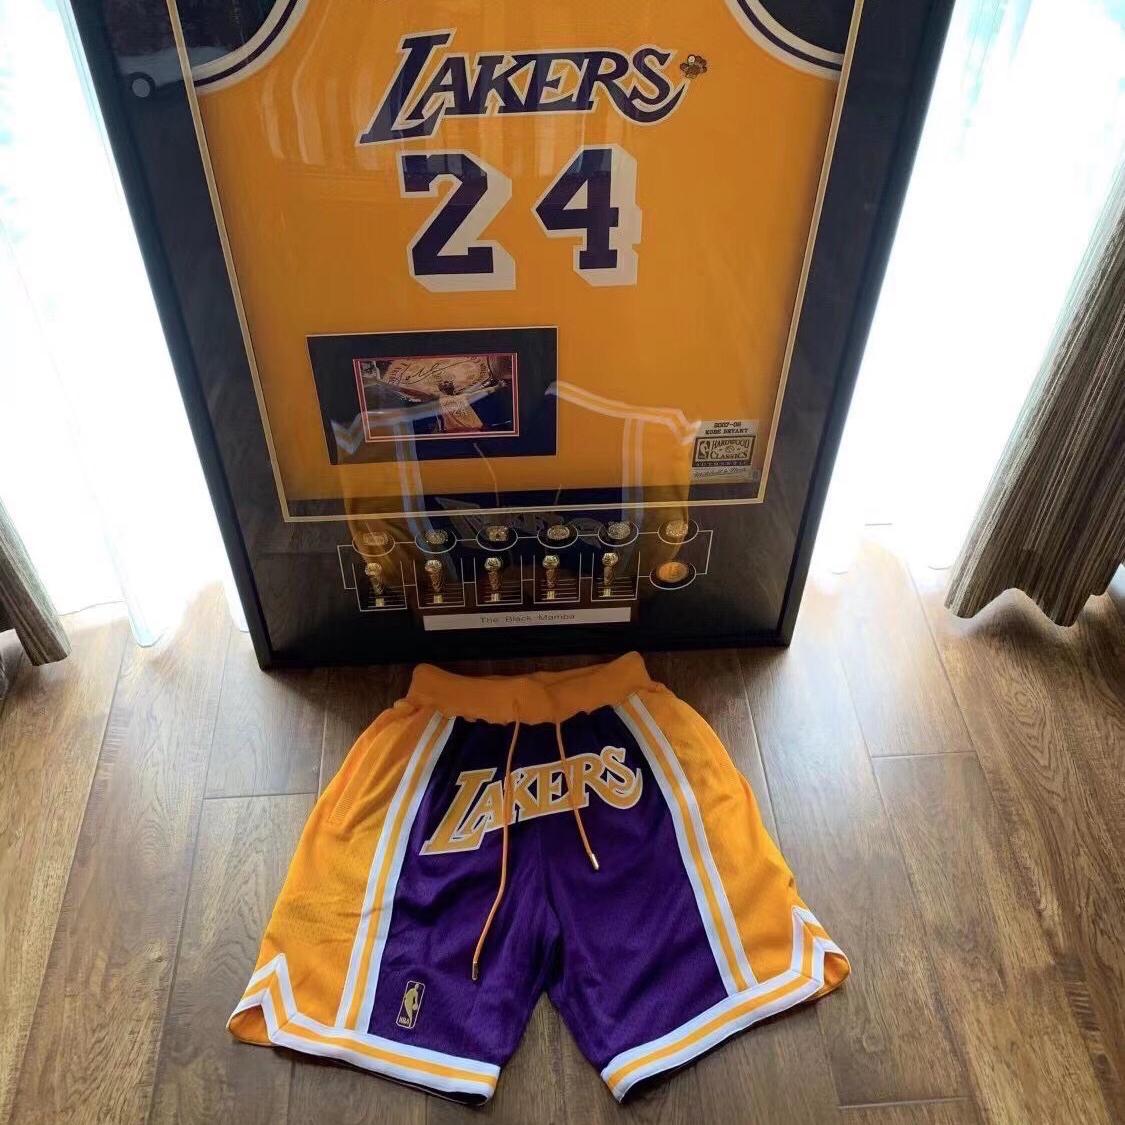 Mitchell Ness JD LEKERS湖人詹姆斯科比运动宽松复古篮球裤短裤